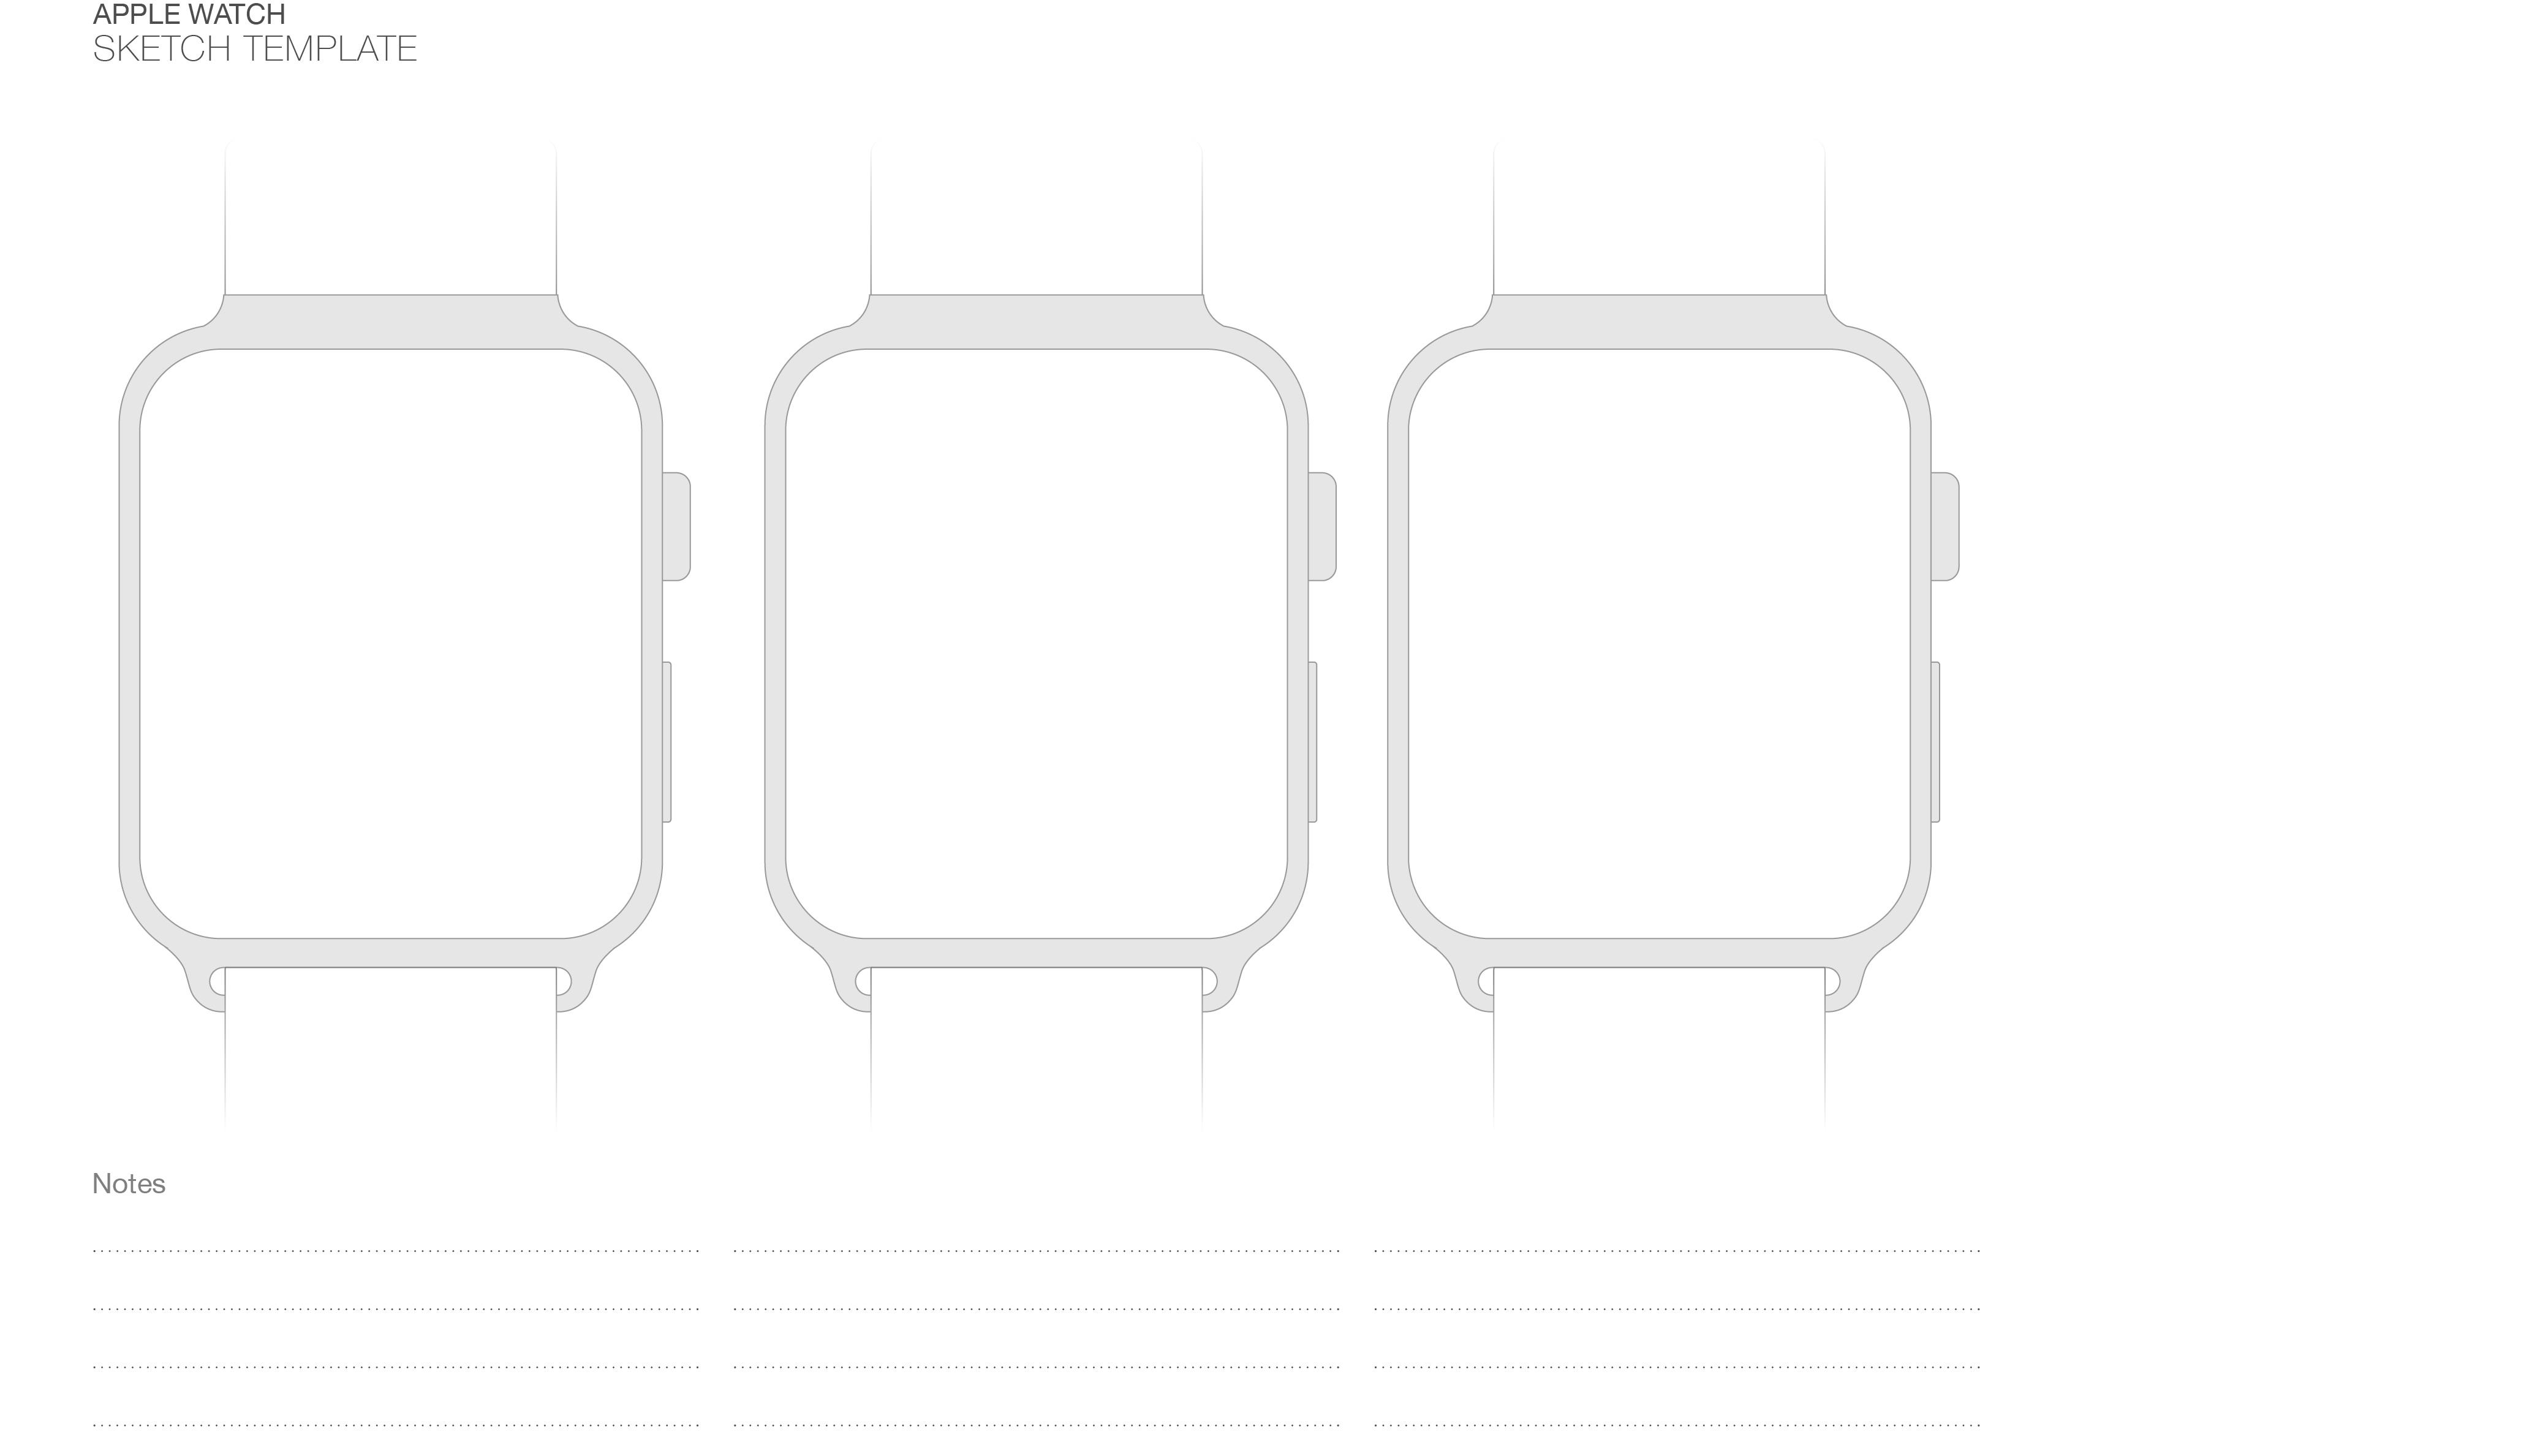 Apple Watch Sketch Template - Comést Savatino